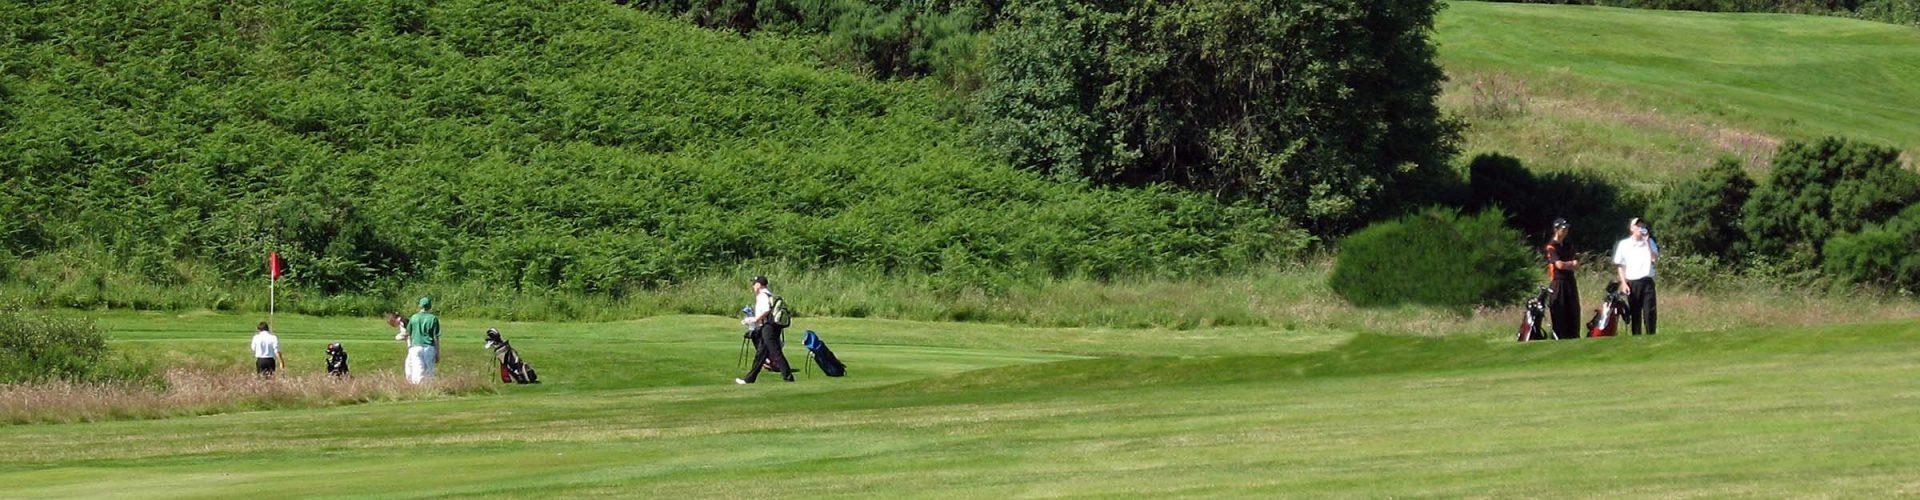 Golfers on Gleneagles golf course